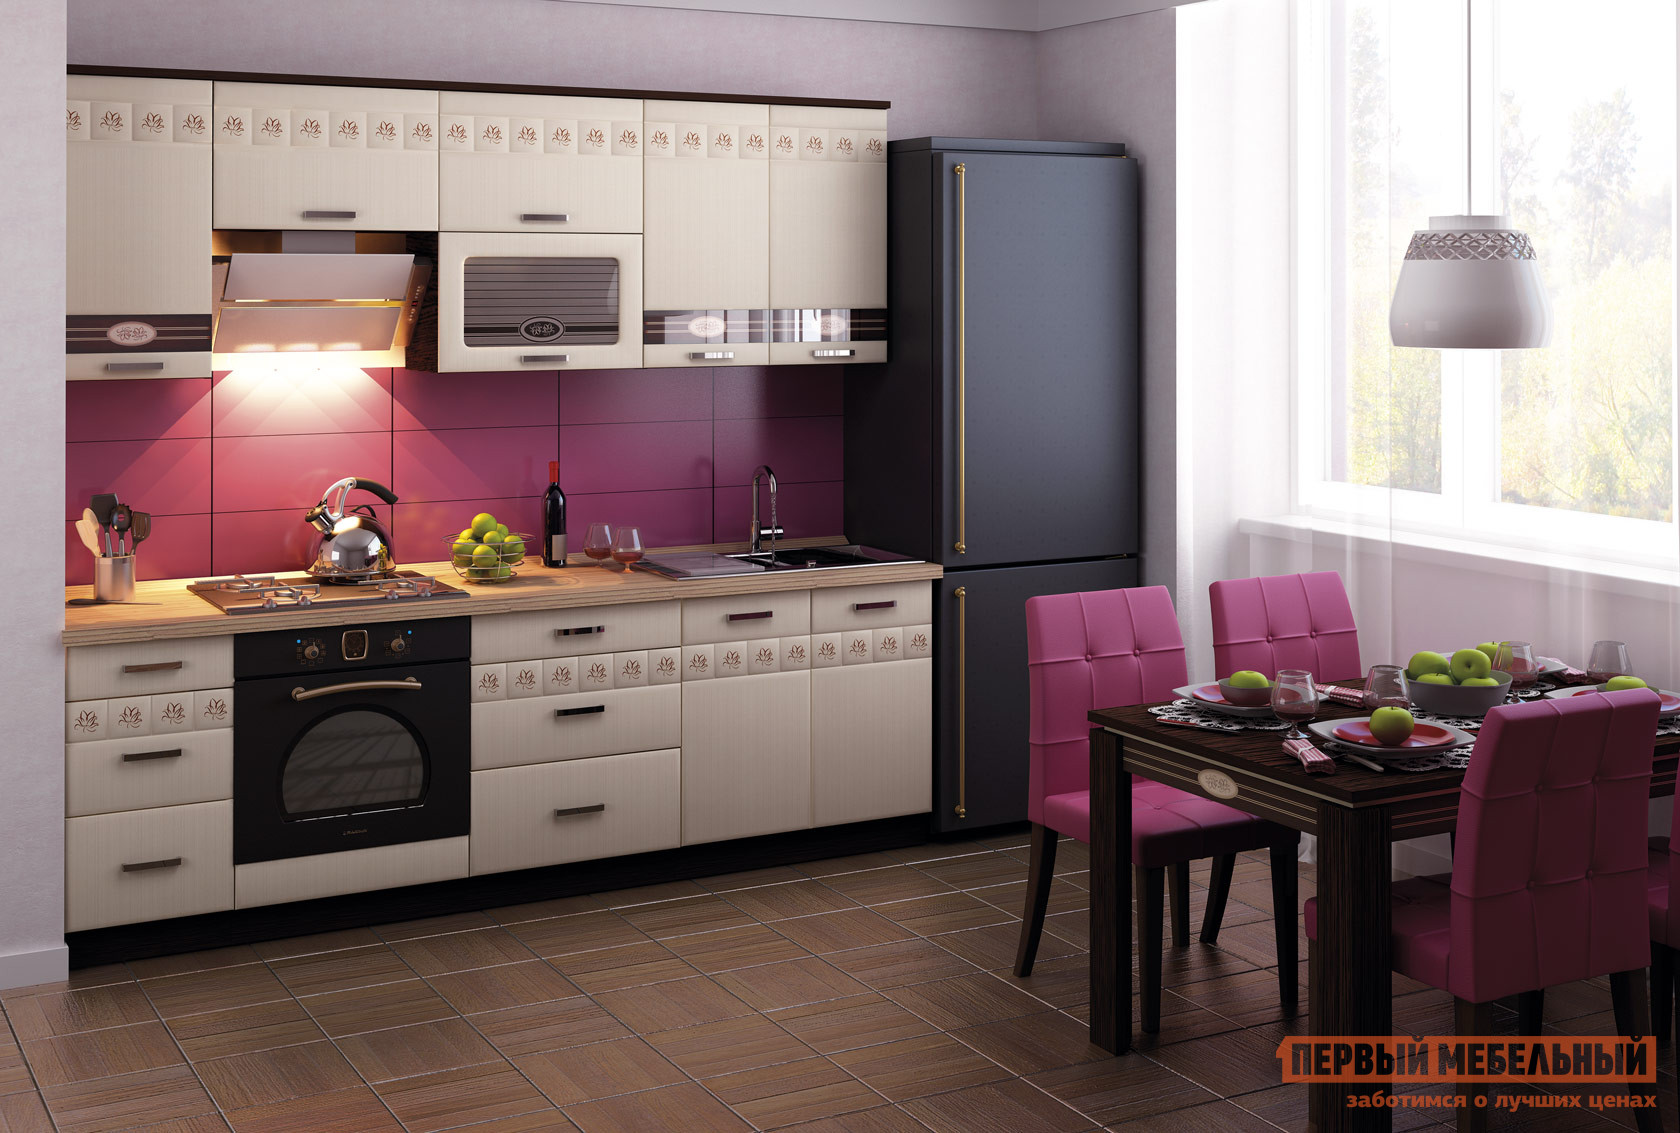 Кухонный гарнитур Витра Аврора 240 кухонный гарнитур витра глория 3 к2